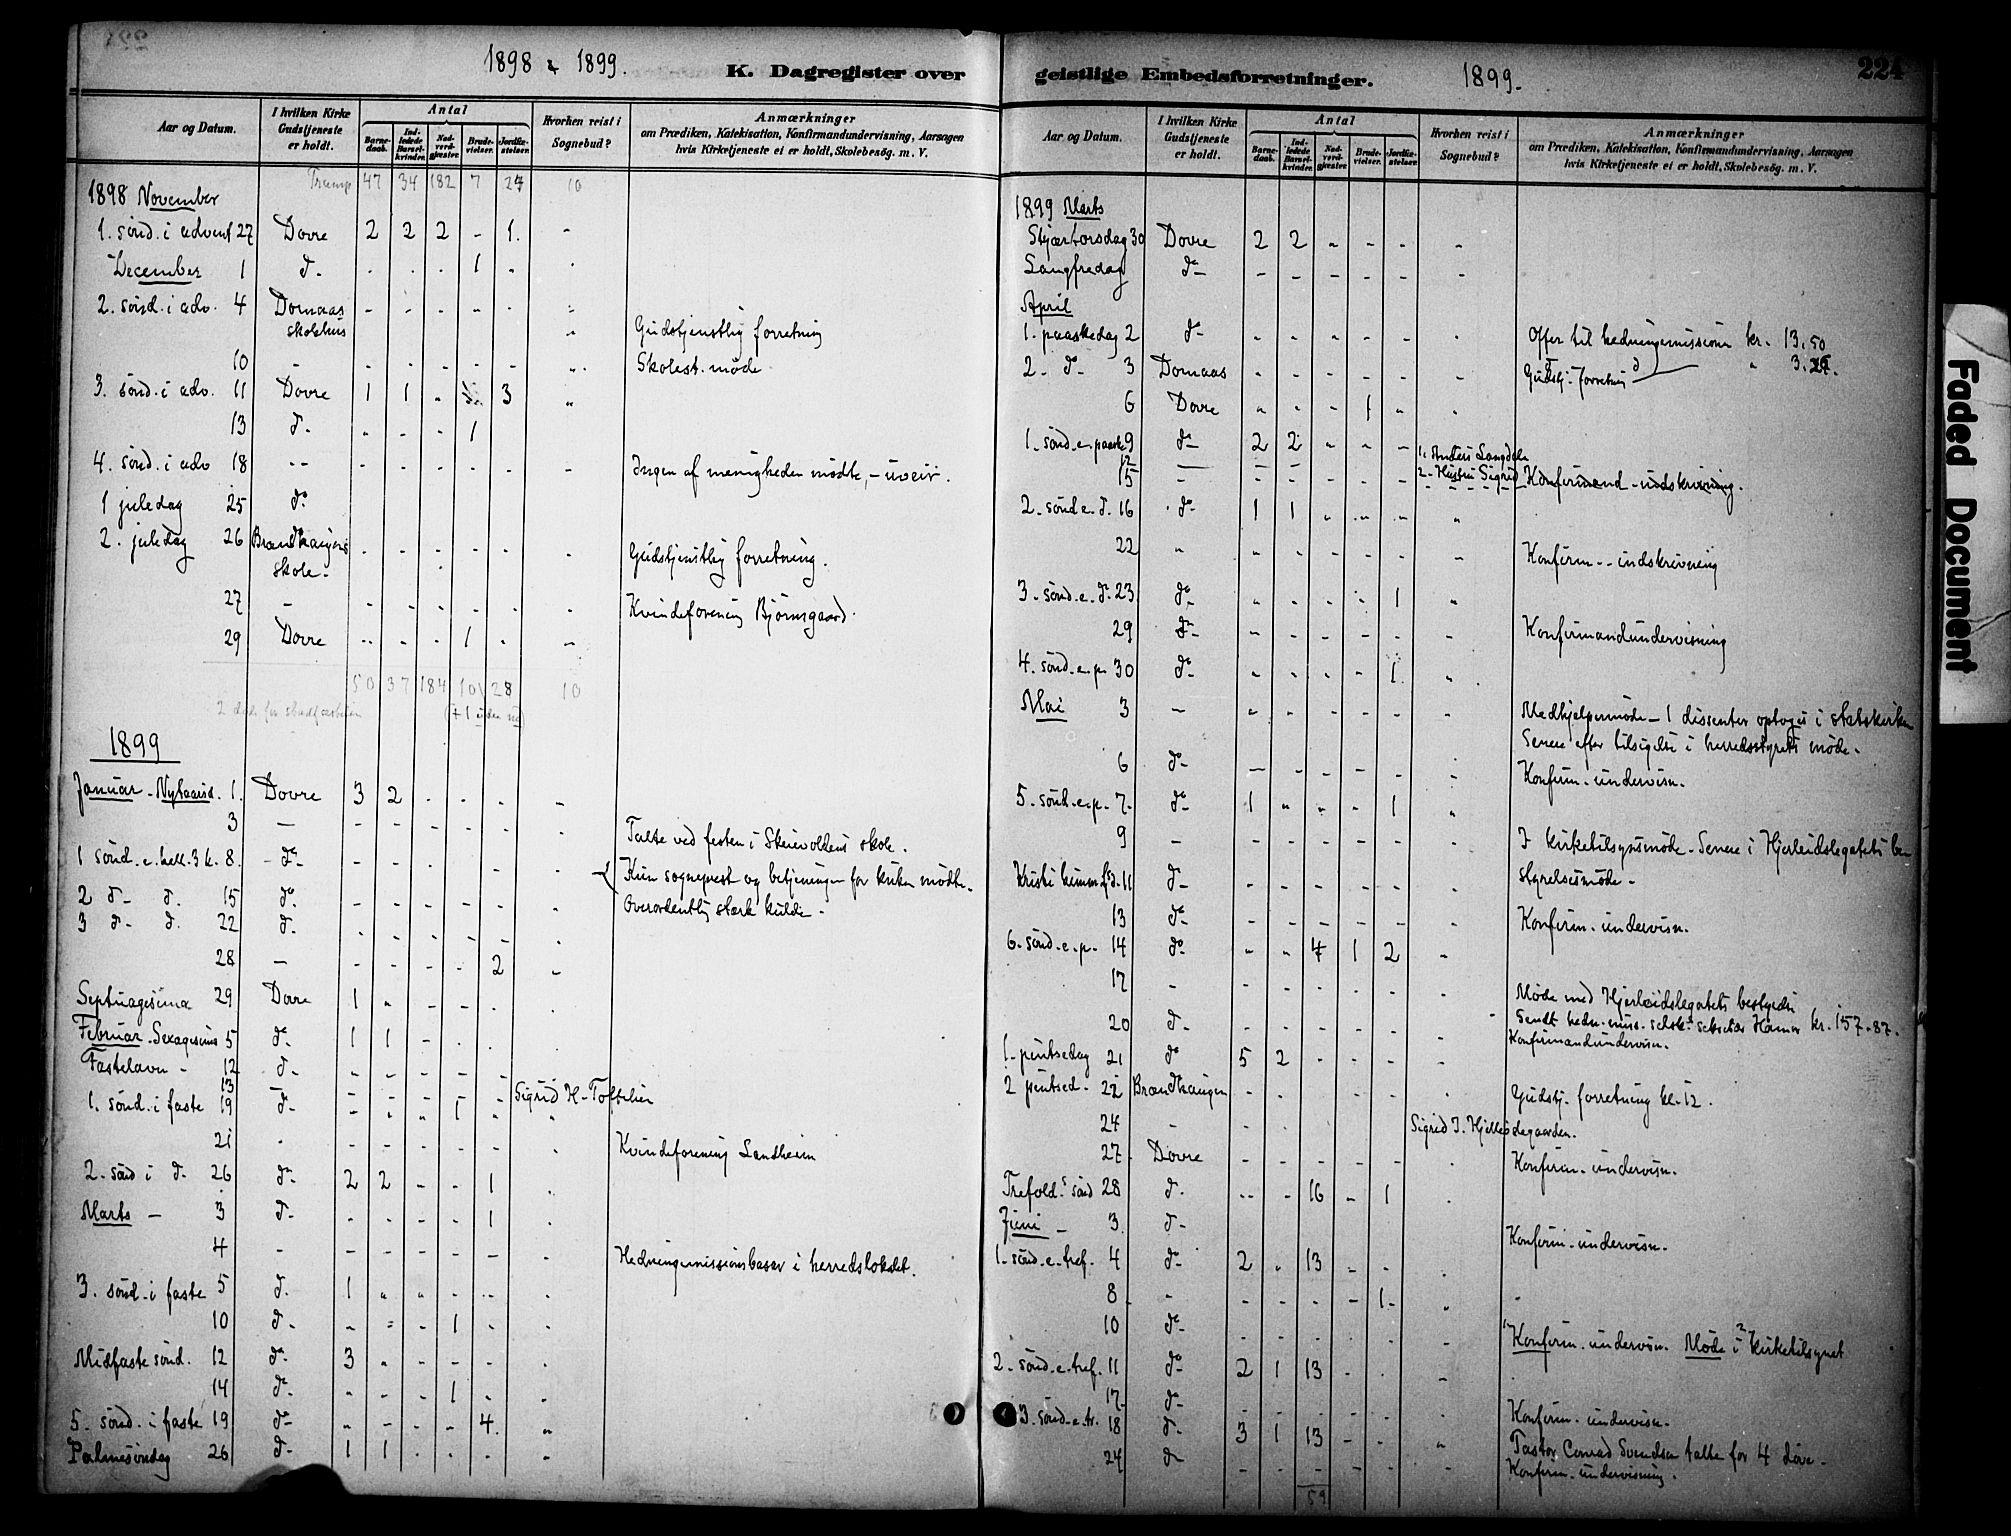 SAH, Dovre prestekontor, Ministerialbok nr. 3, 1891-1901, s. 224